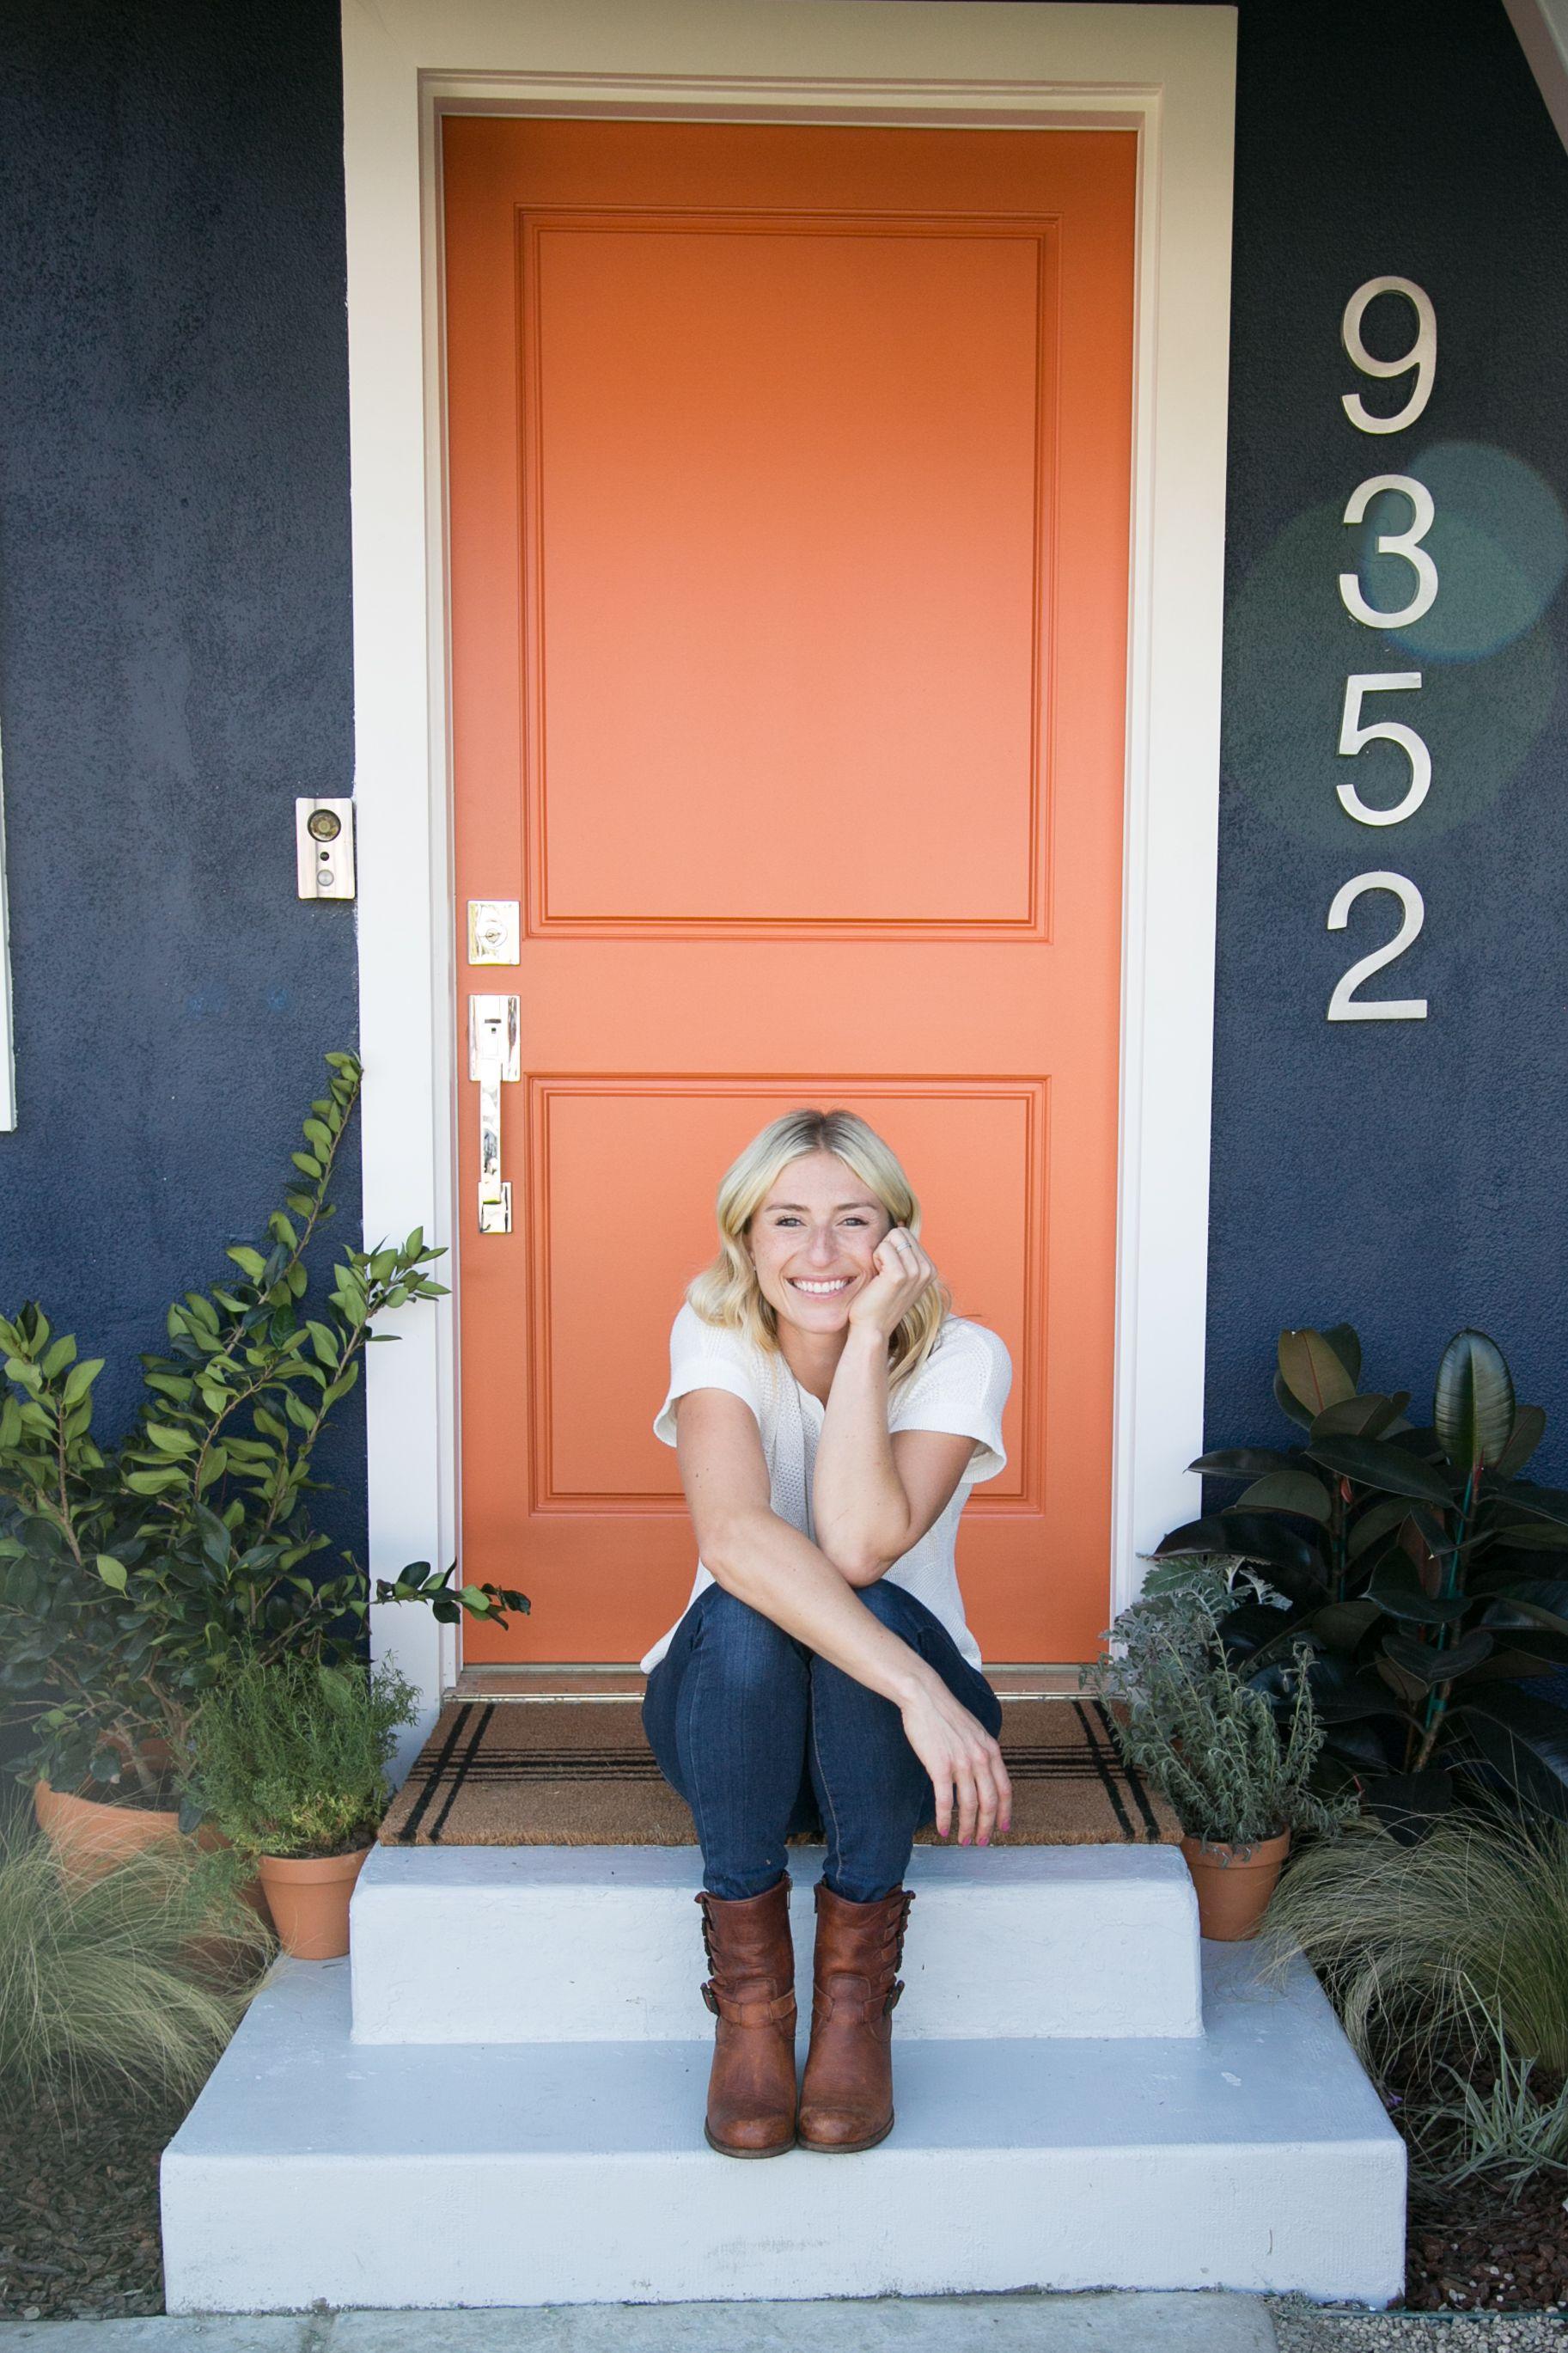 HGTV Star Jasmine Roth Explains How She Landed Her Show Hidden Potential